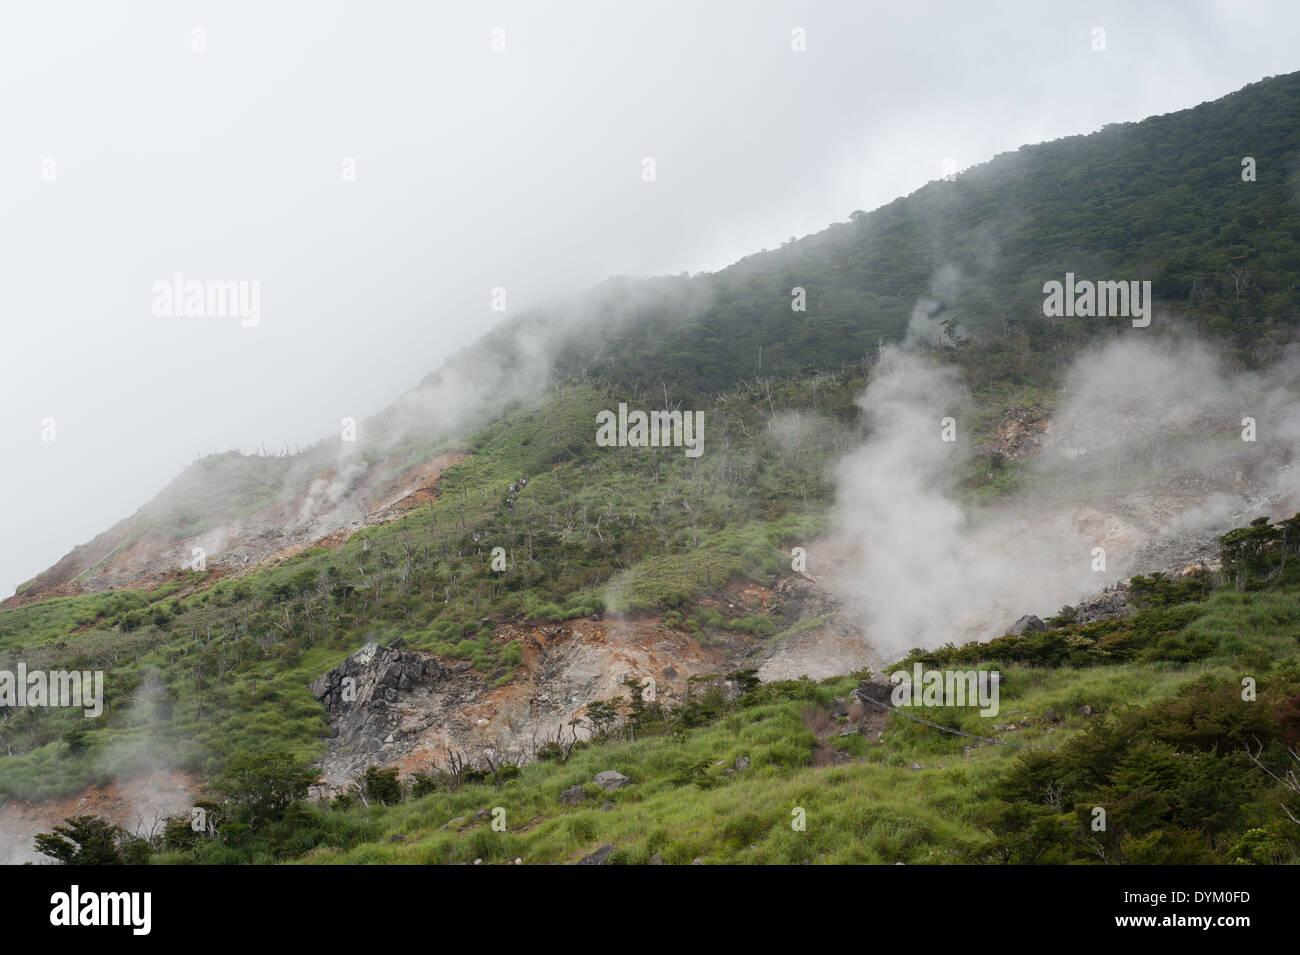 Smoke In Owakudani, Hakone, Kanagawa Prefecture, Japan - Stock Image